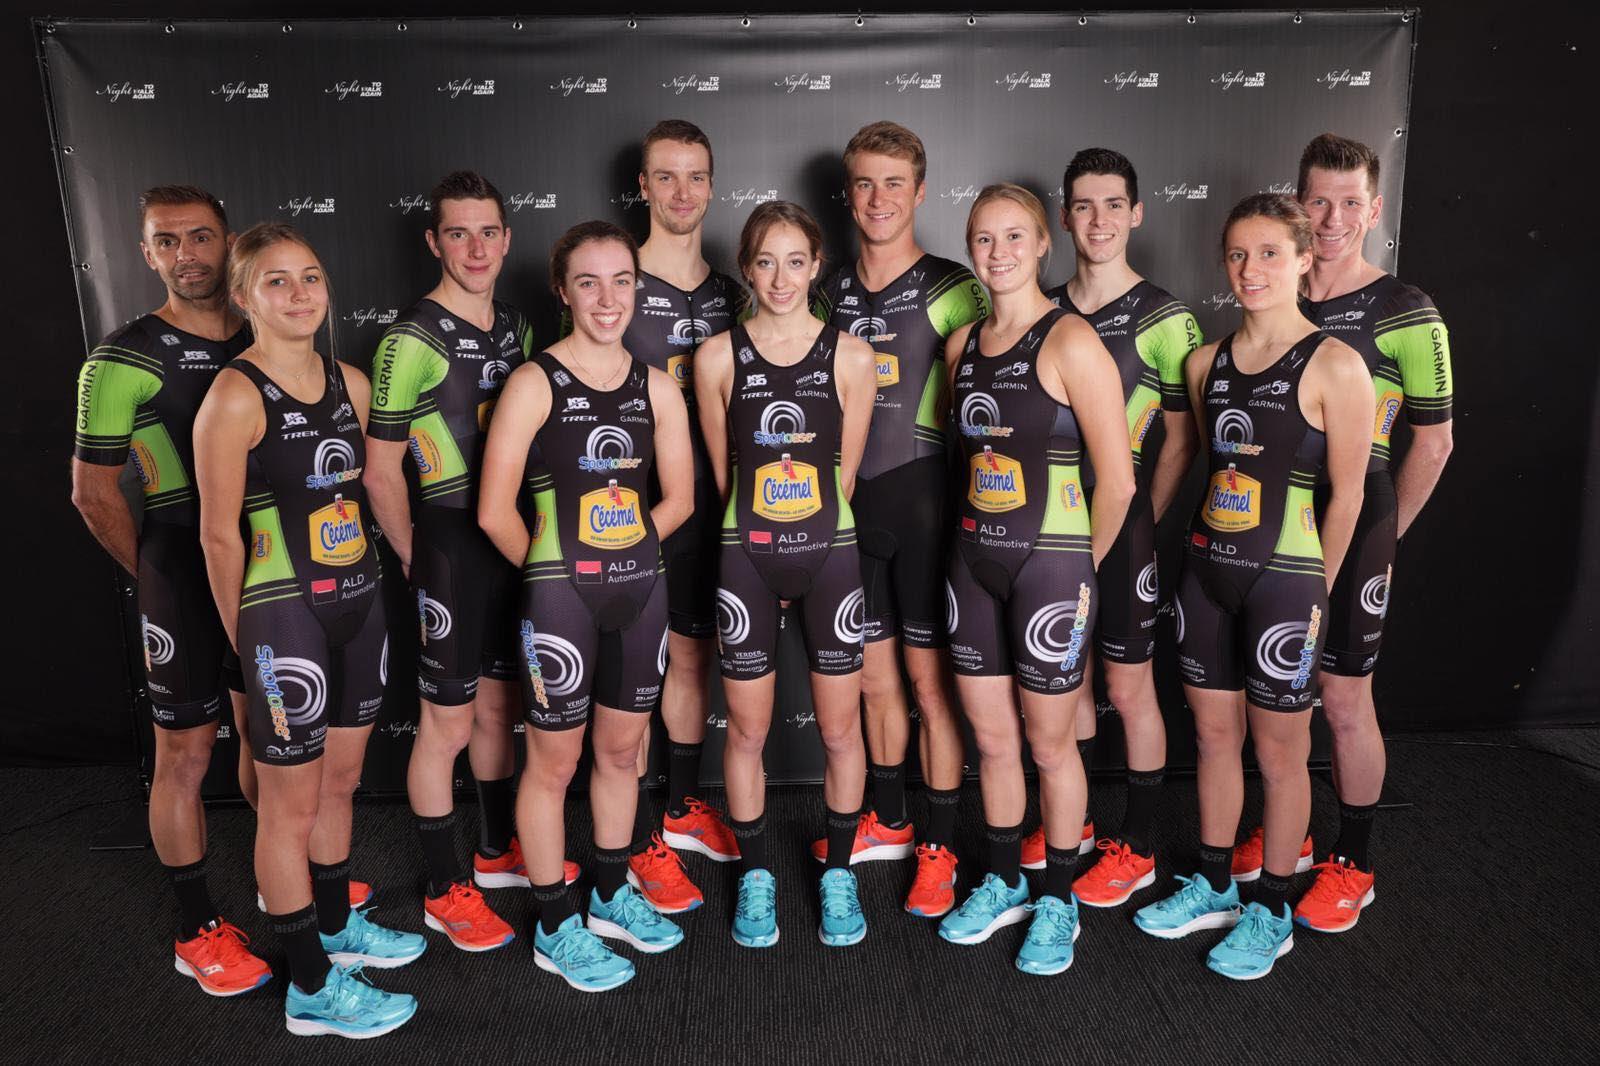 185-Sportoase-Cecemel team breidt uit in 2019